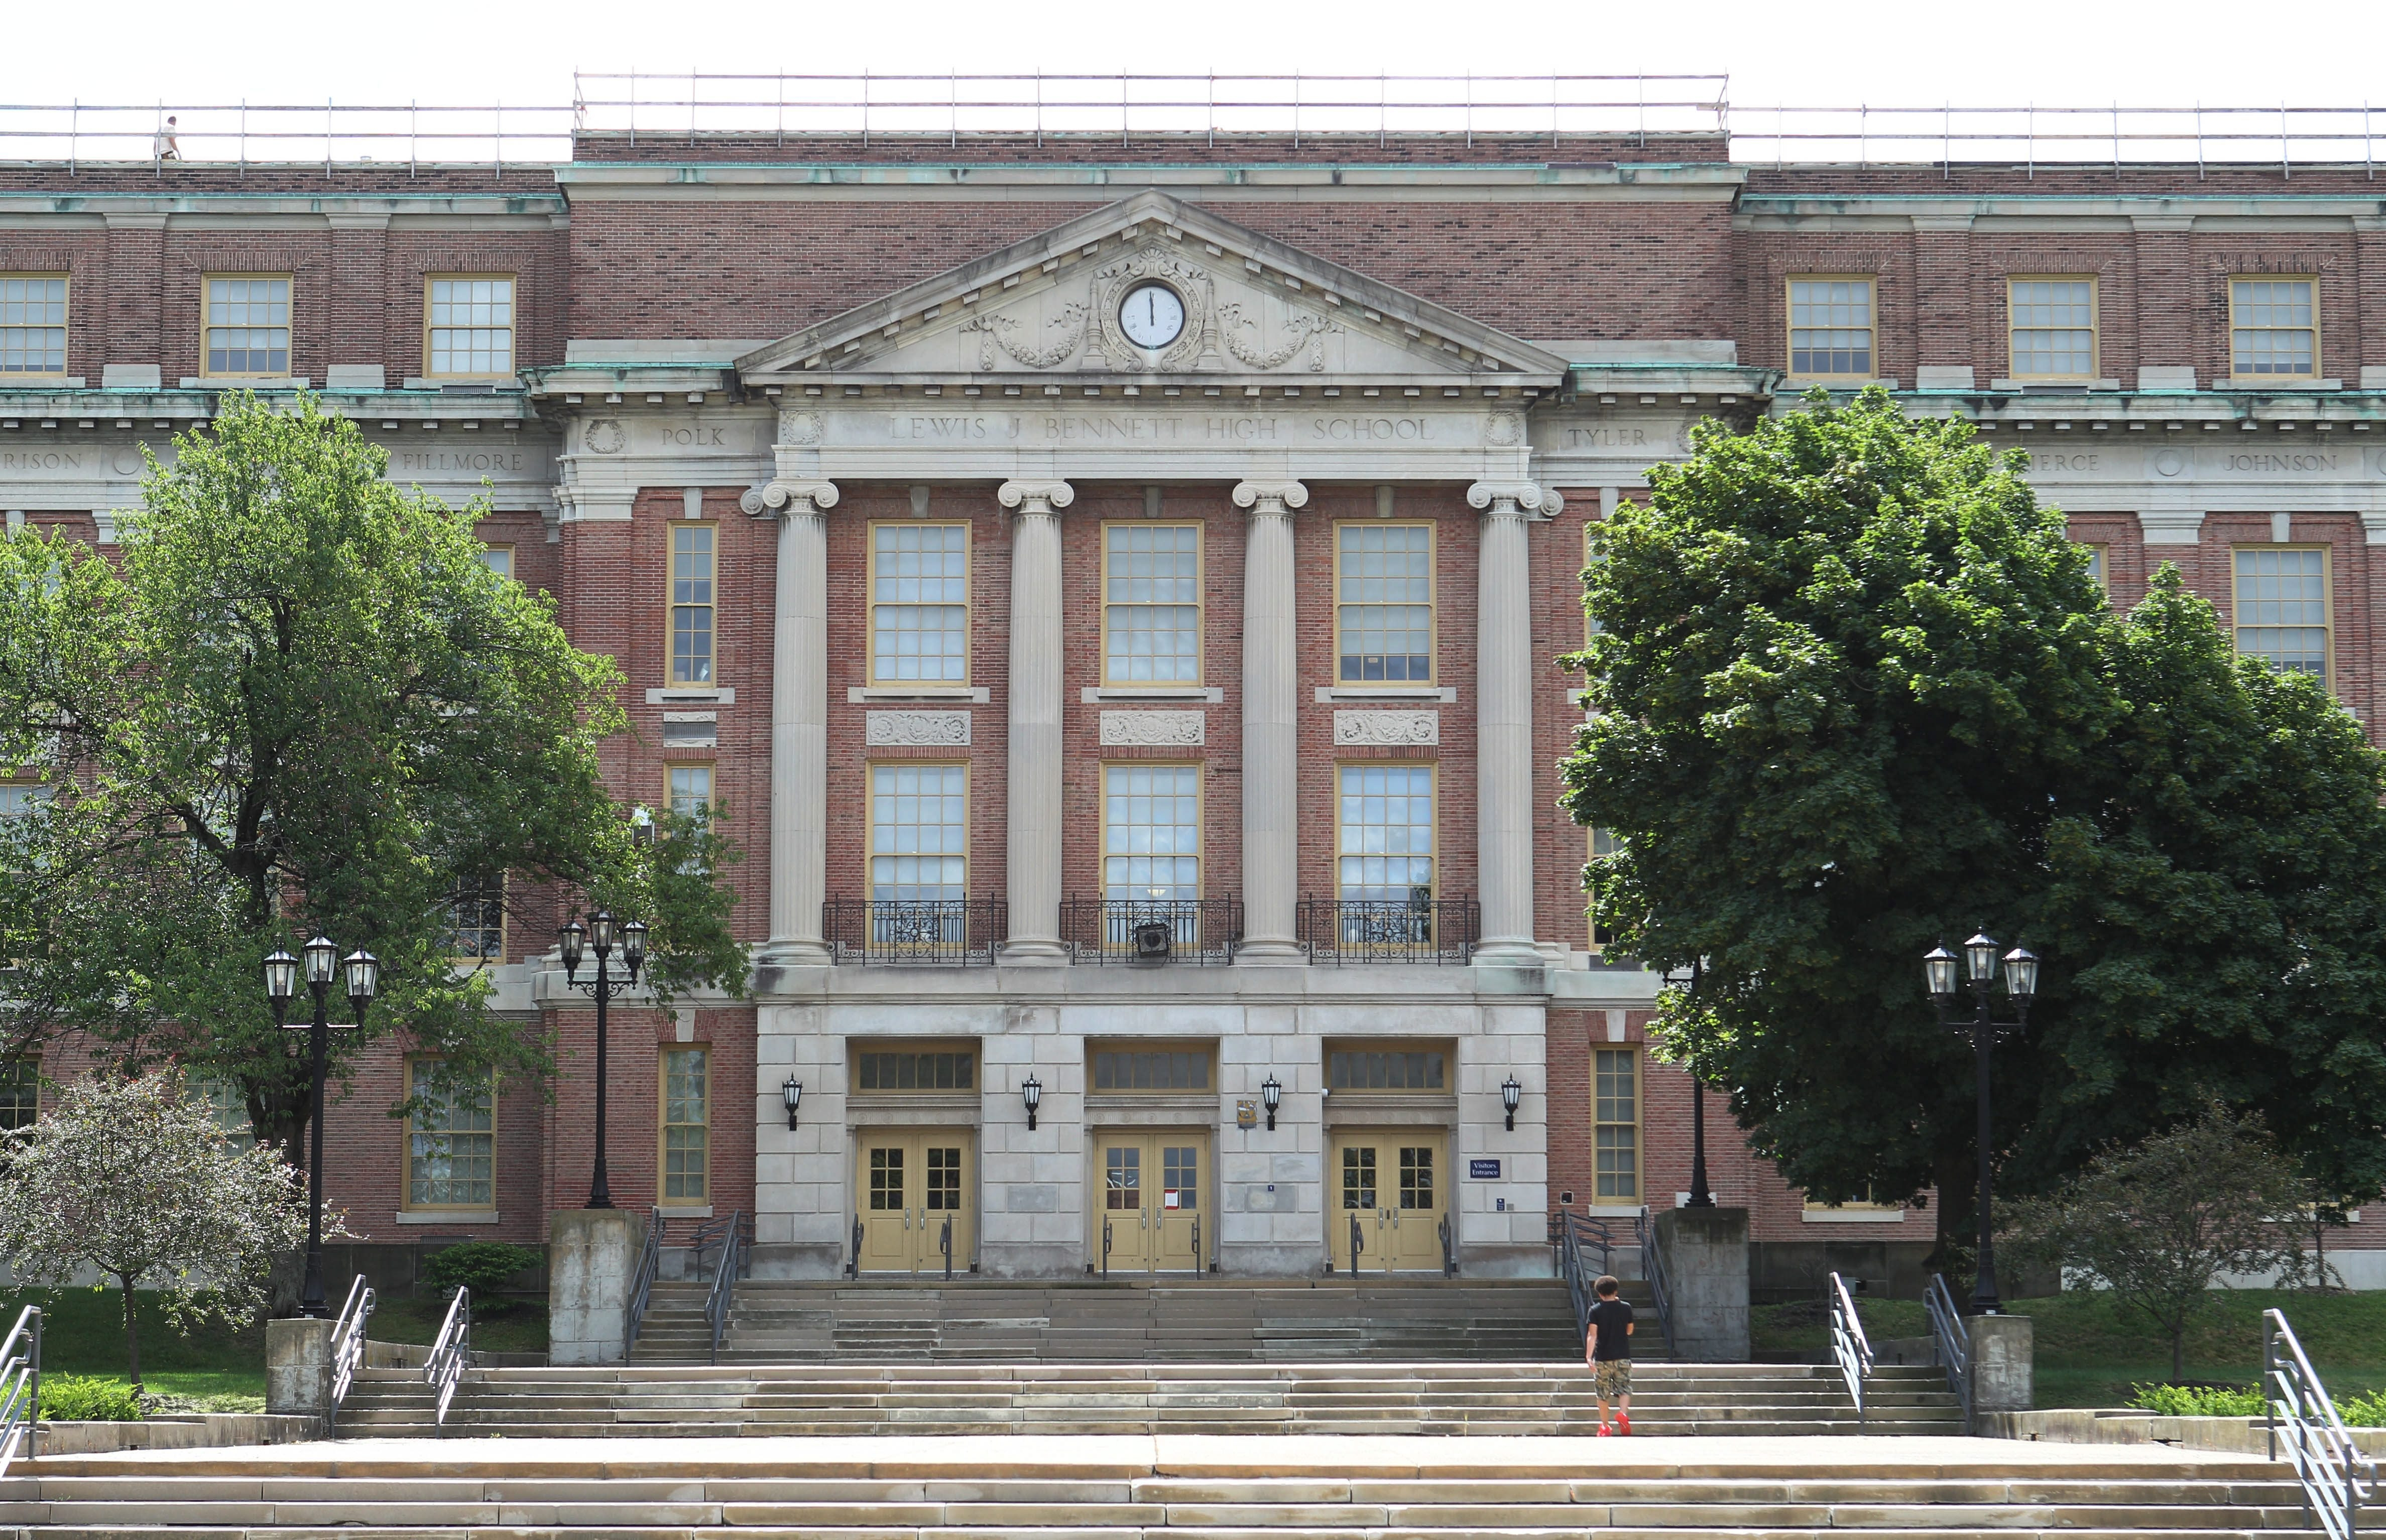 Buffalo city school Bennett High School, Wednesday, July 24, 2013.  (Sharon Cantillon/Buffalo News)